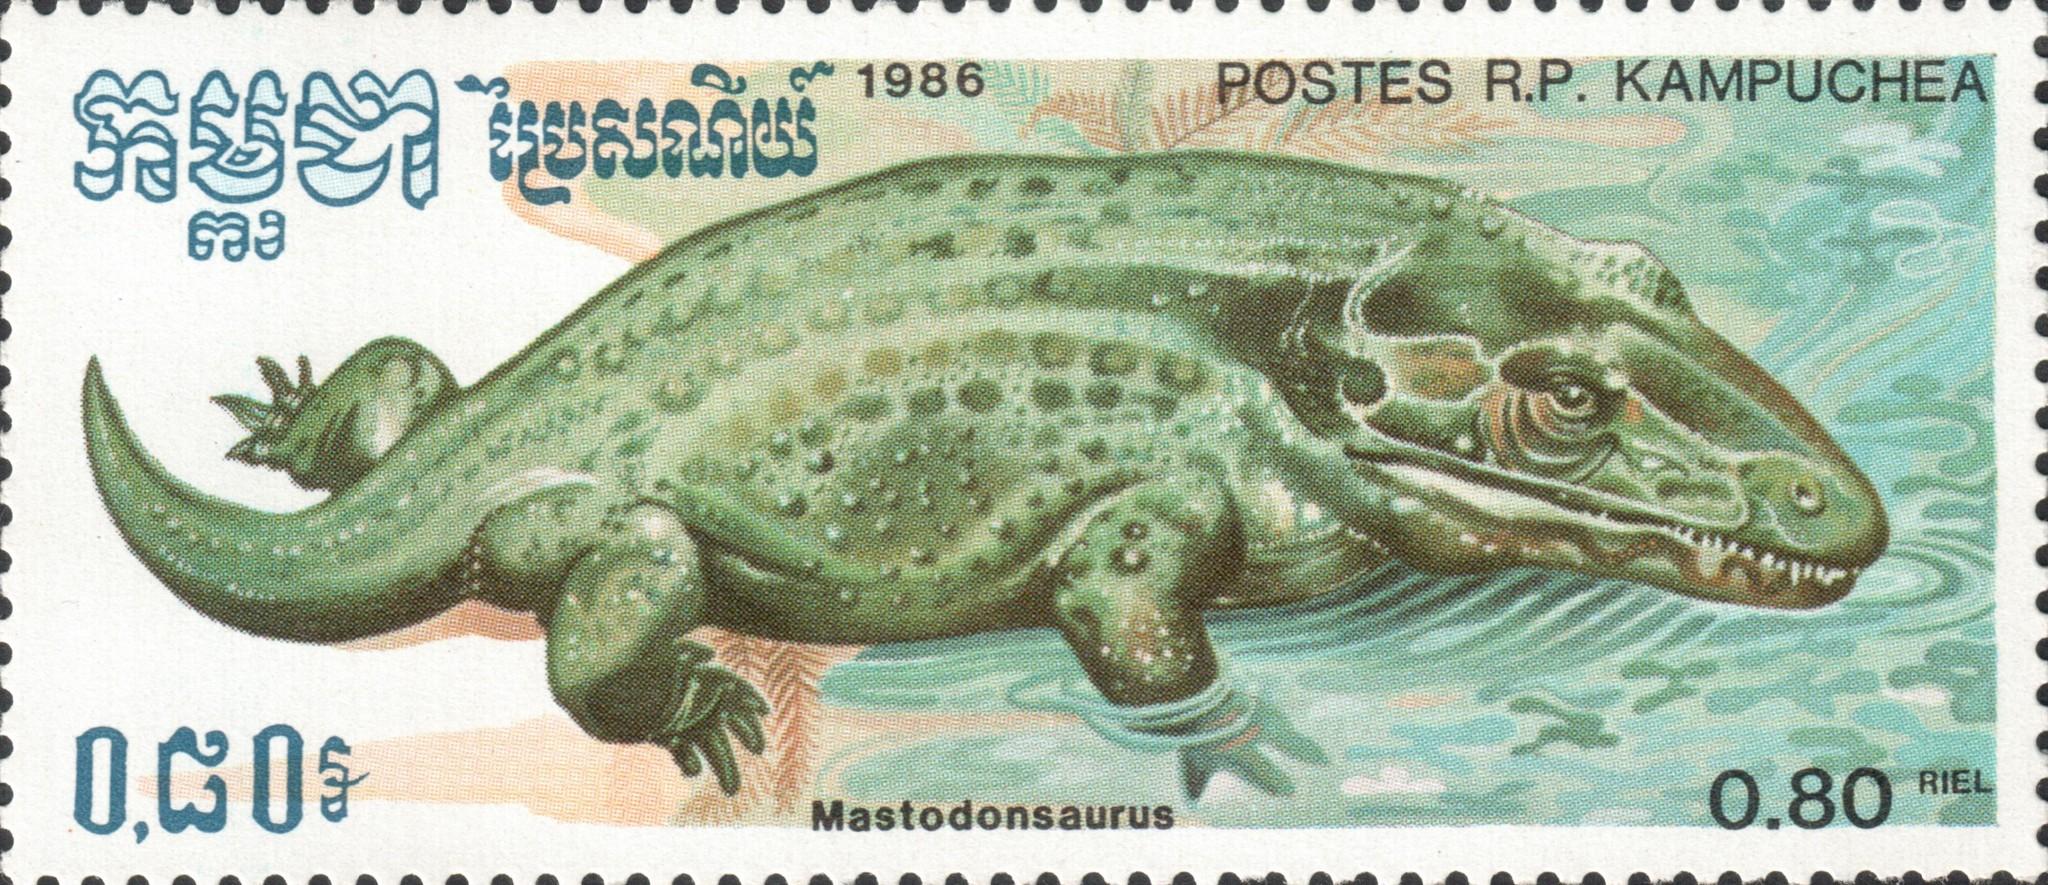 Мастодонзавр (Mastodonsaurus)